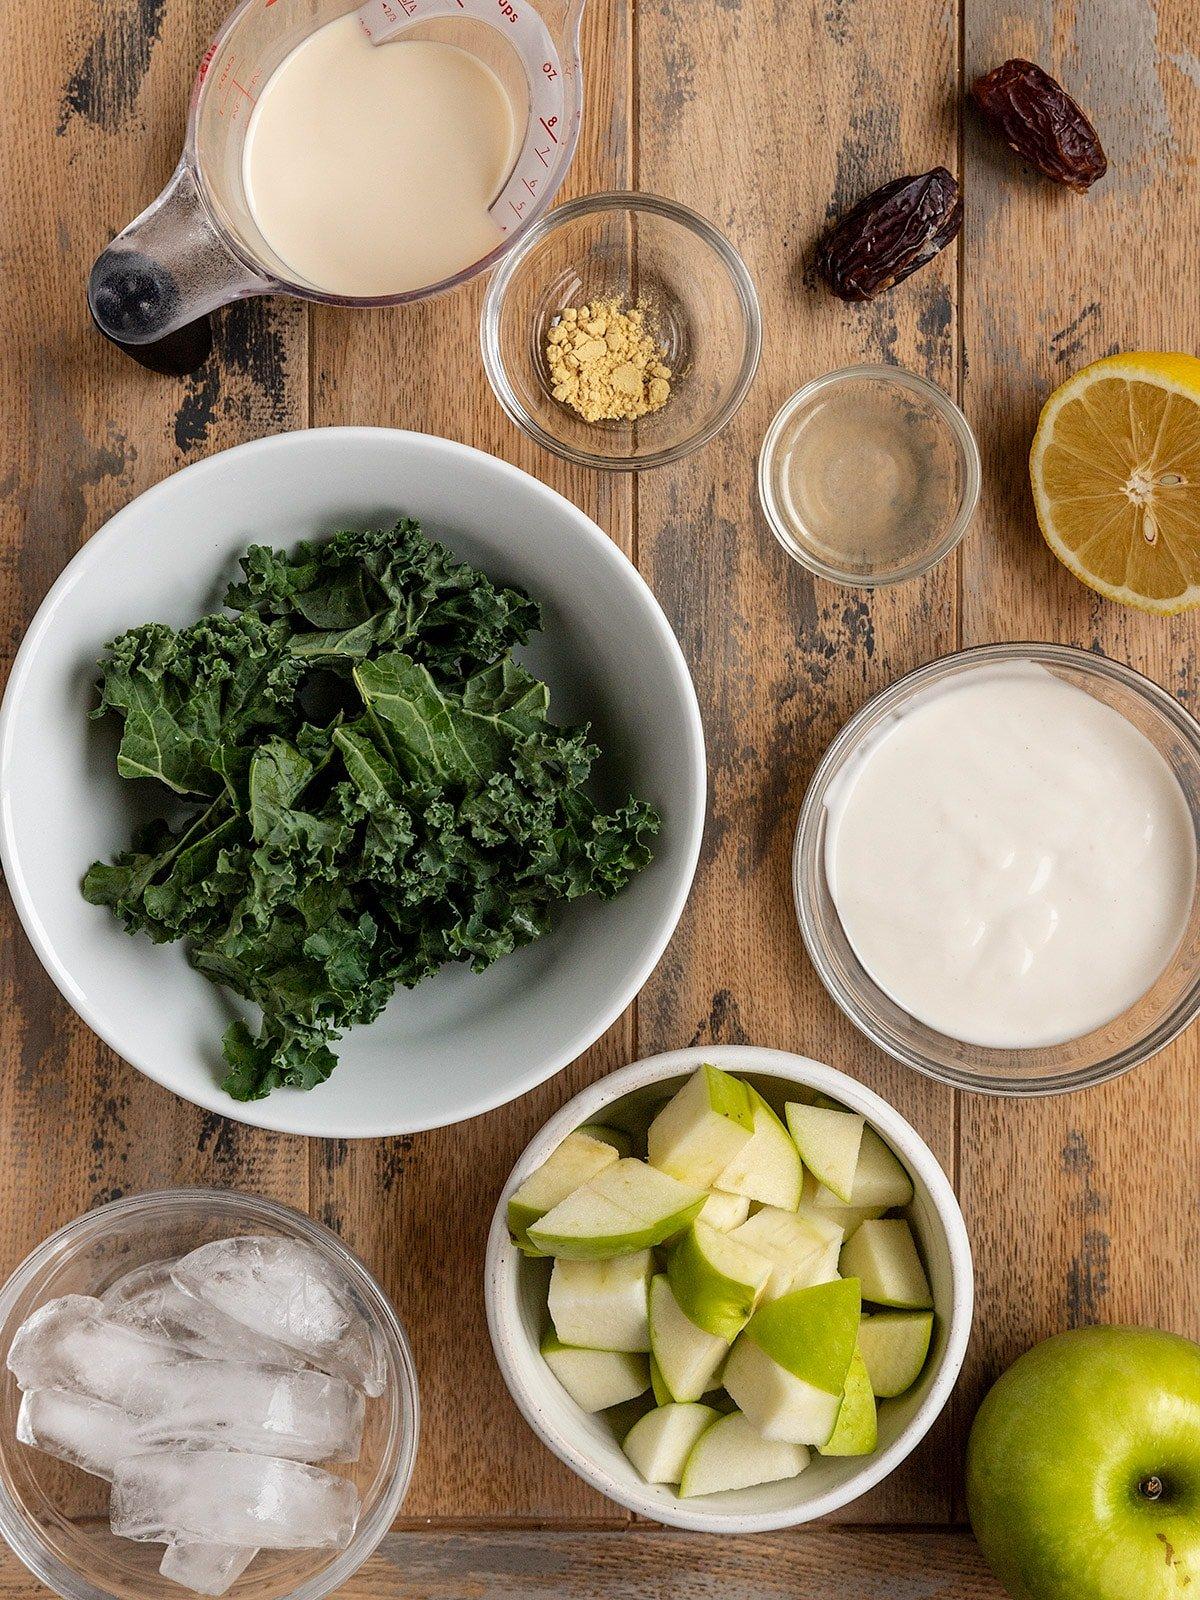 overhead shot of smoothie ingredients in bowls including kale, green apple, yogurt, lemon juice, oat milk, medjool dates, ice, and ginger